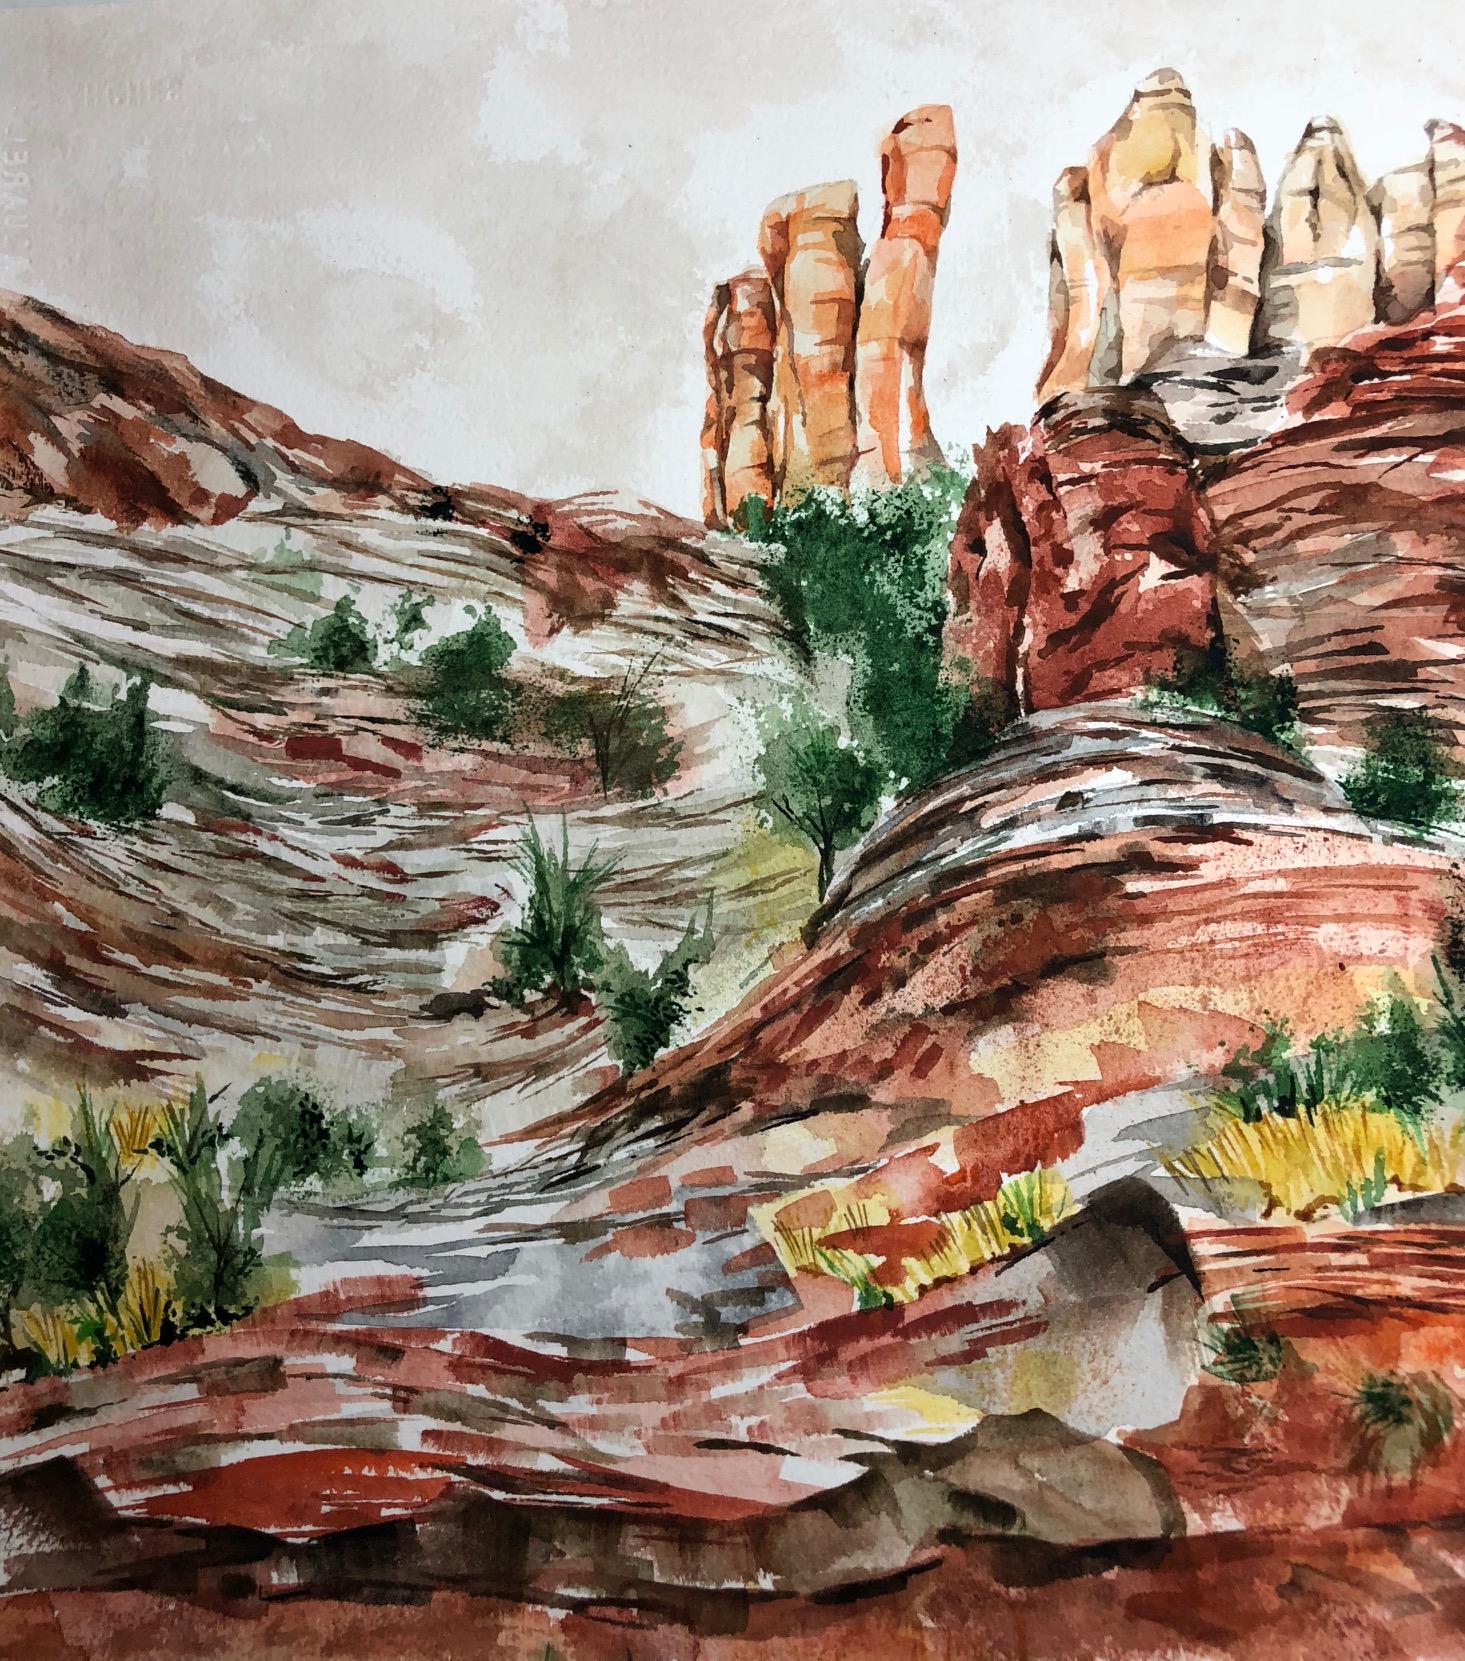 "Sedona 12.25 x 11.5"" Watercolor"